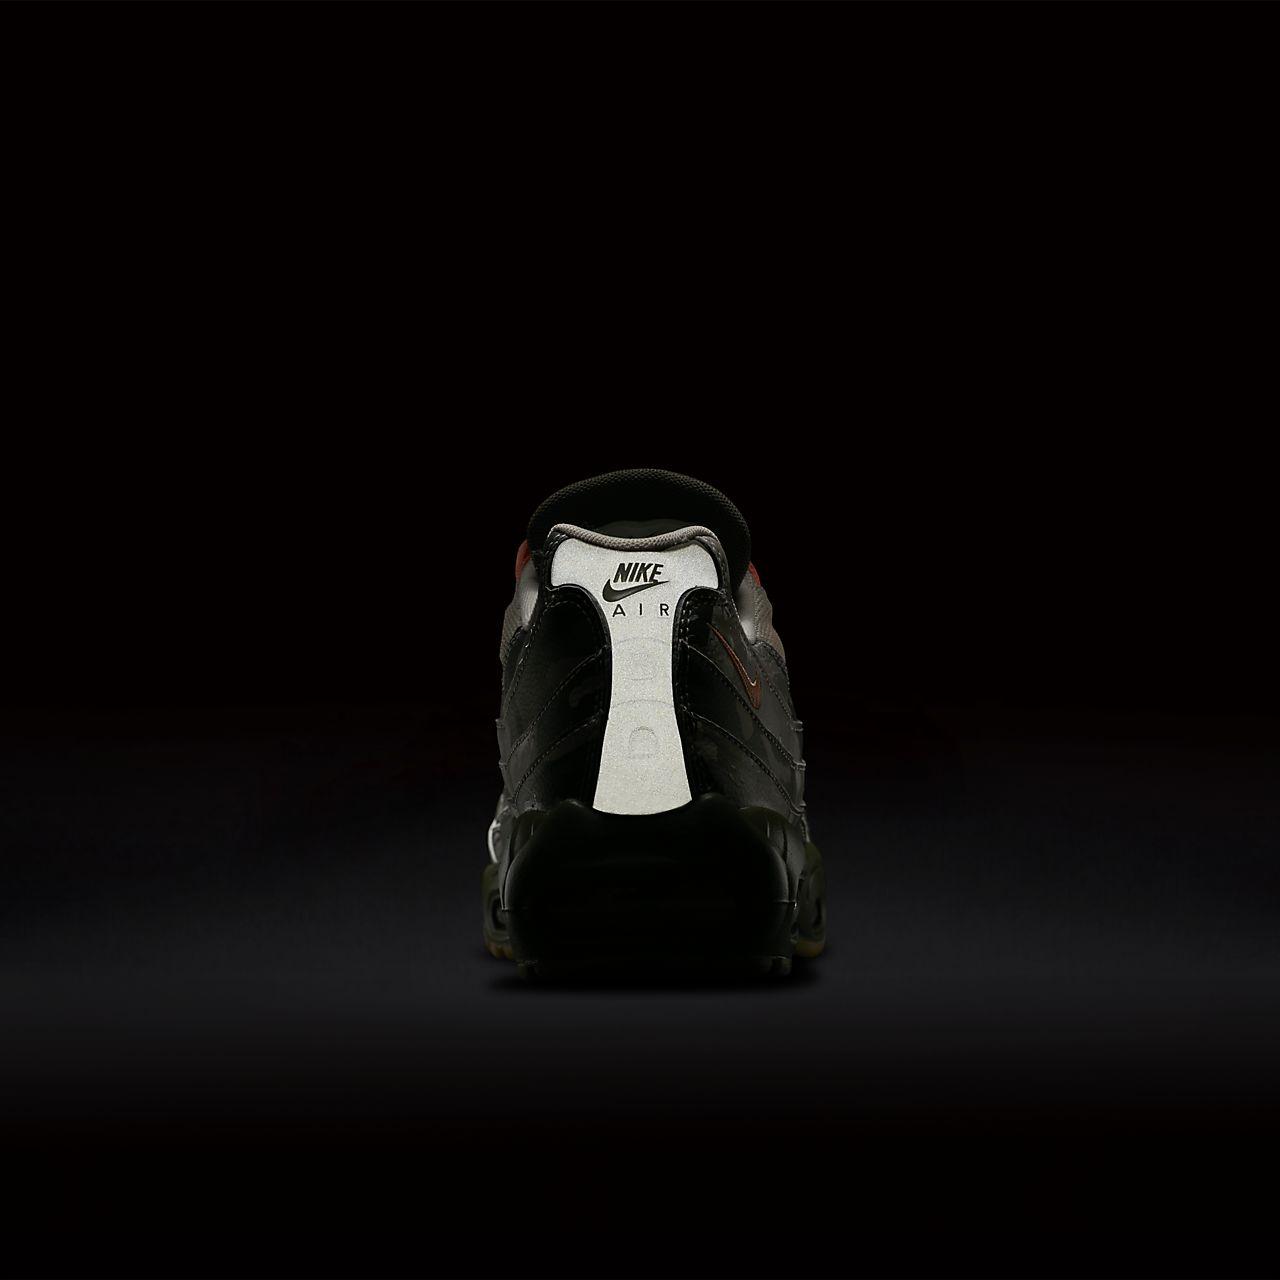 Air Max 95 Essential Mens Lifestyle Shoe (Desert SandBlackCargo KhakiSunset Tint)